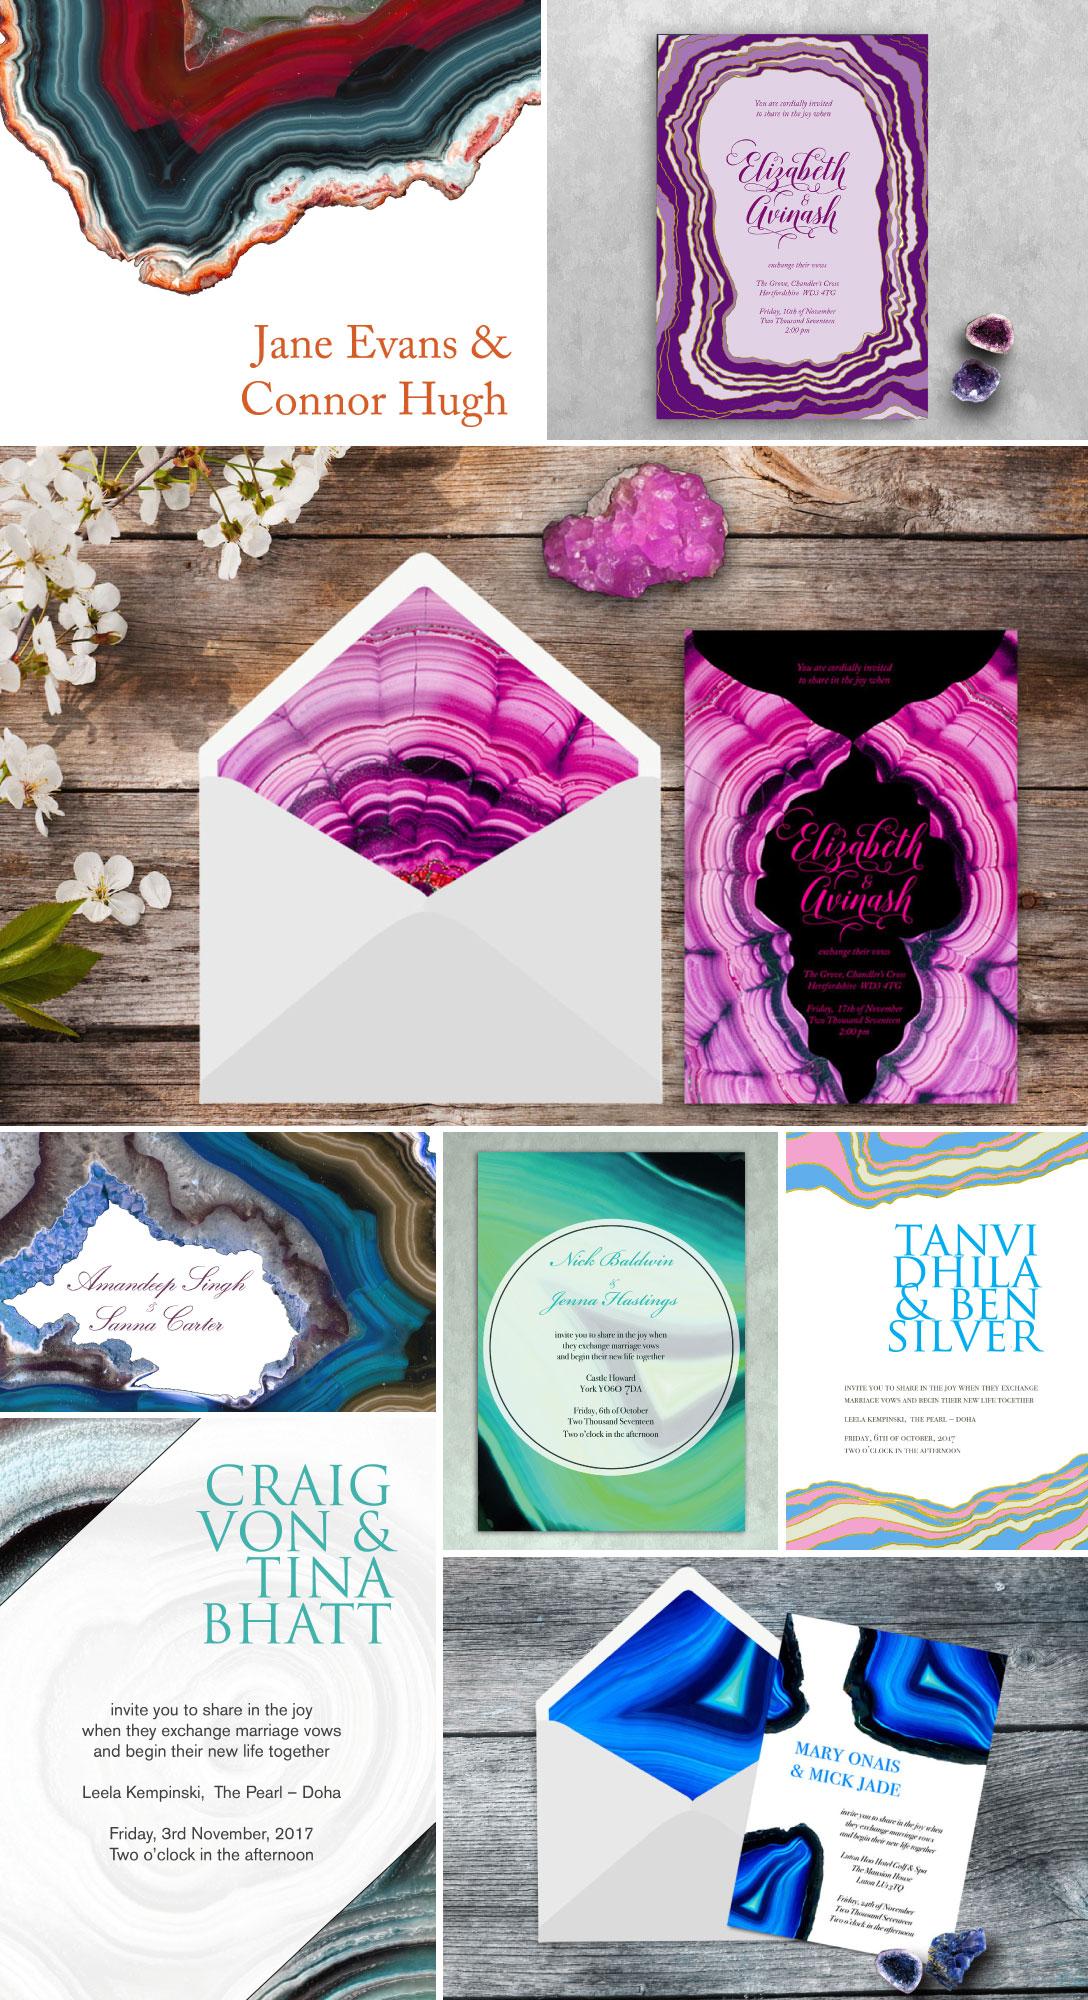 WatercolourCactus-Collage.jpg